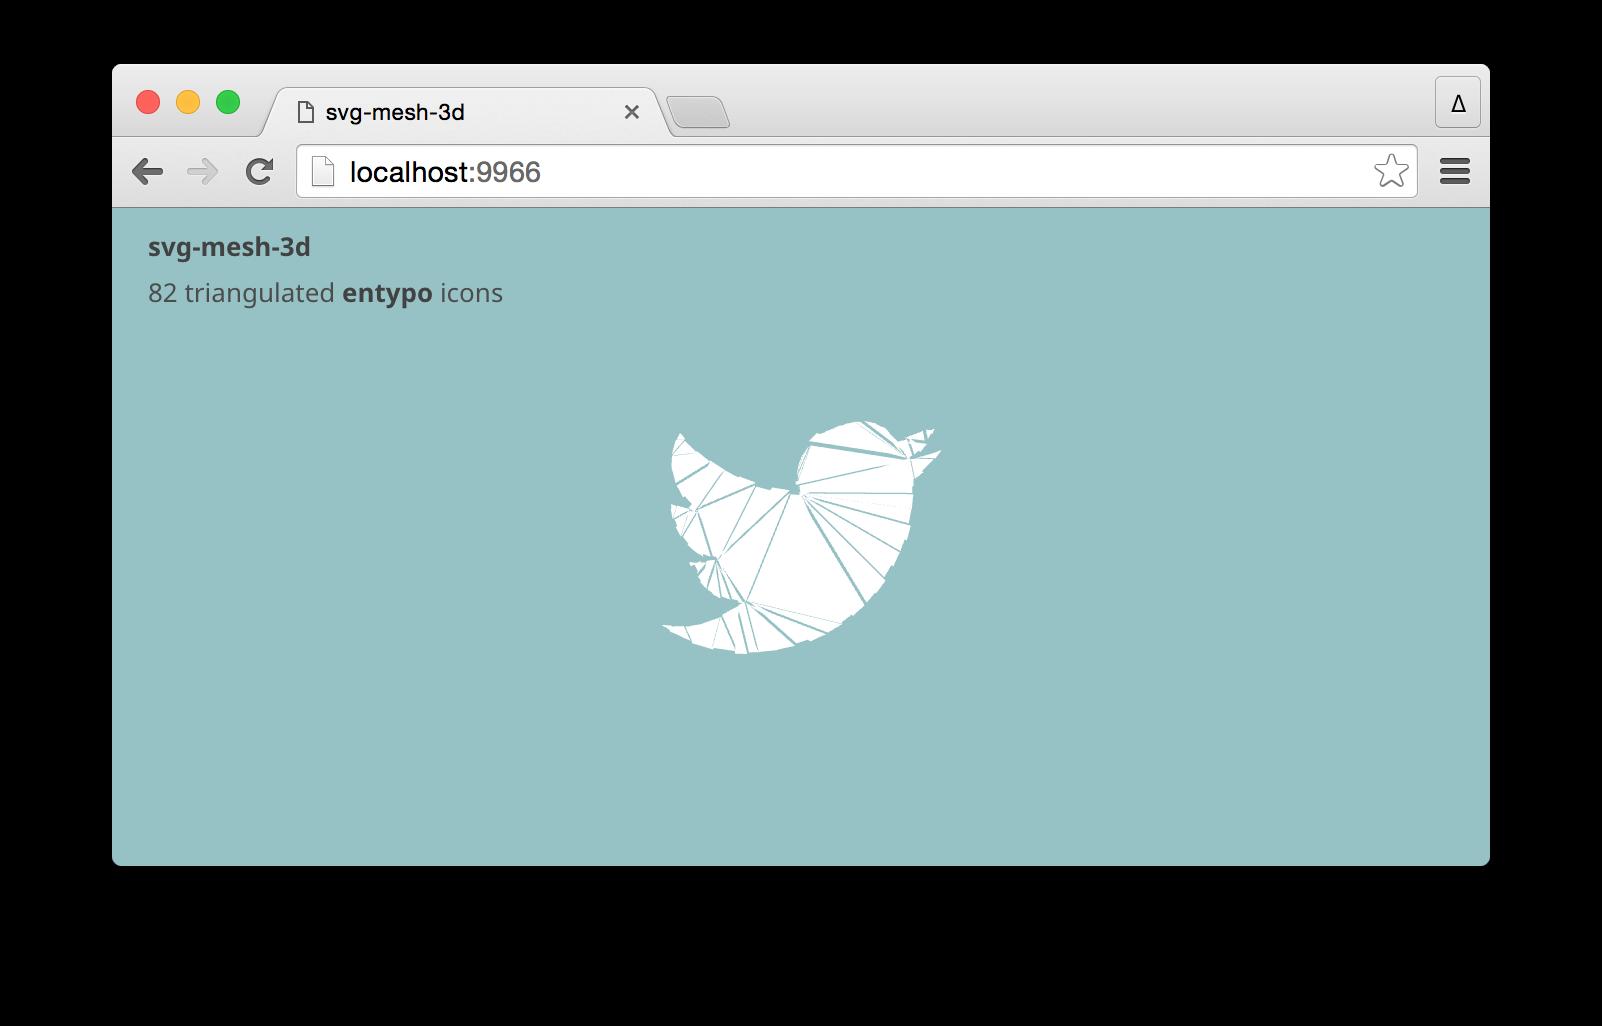 GitHub - mattdesl/svg-mesh-3d: converts a SVG path to a 3D mesh